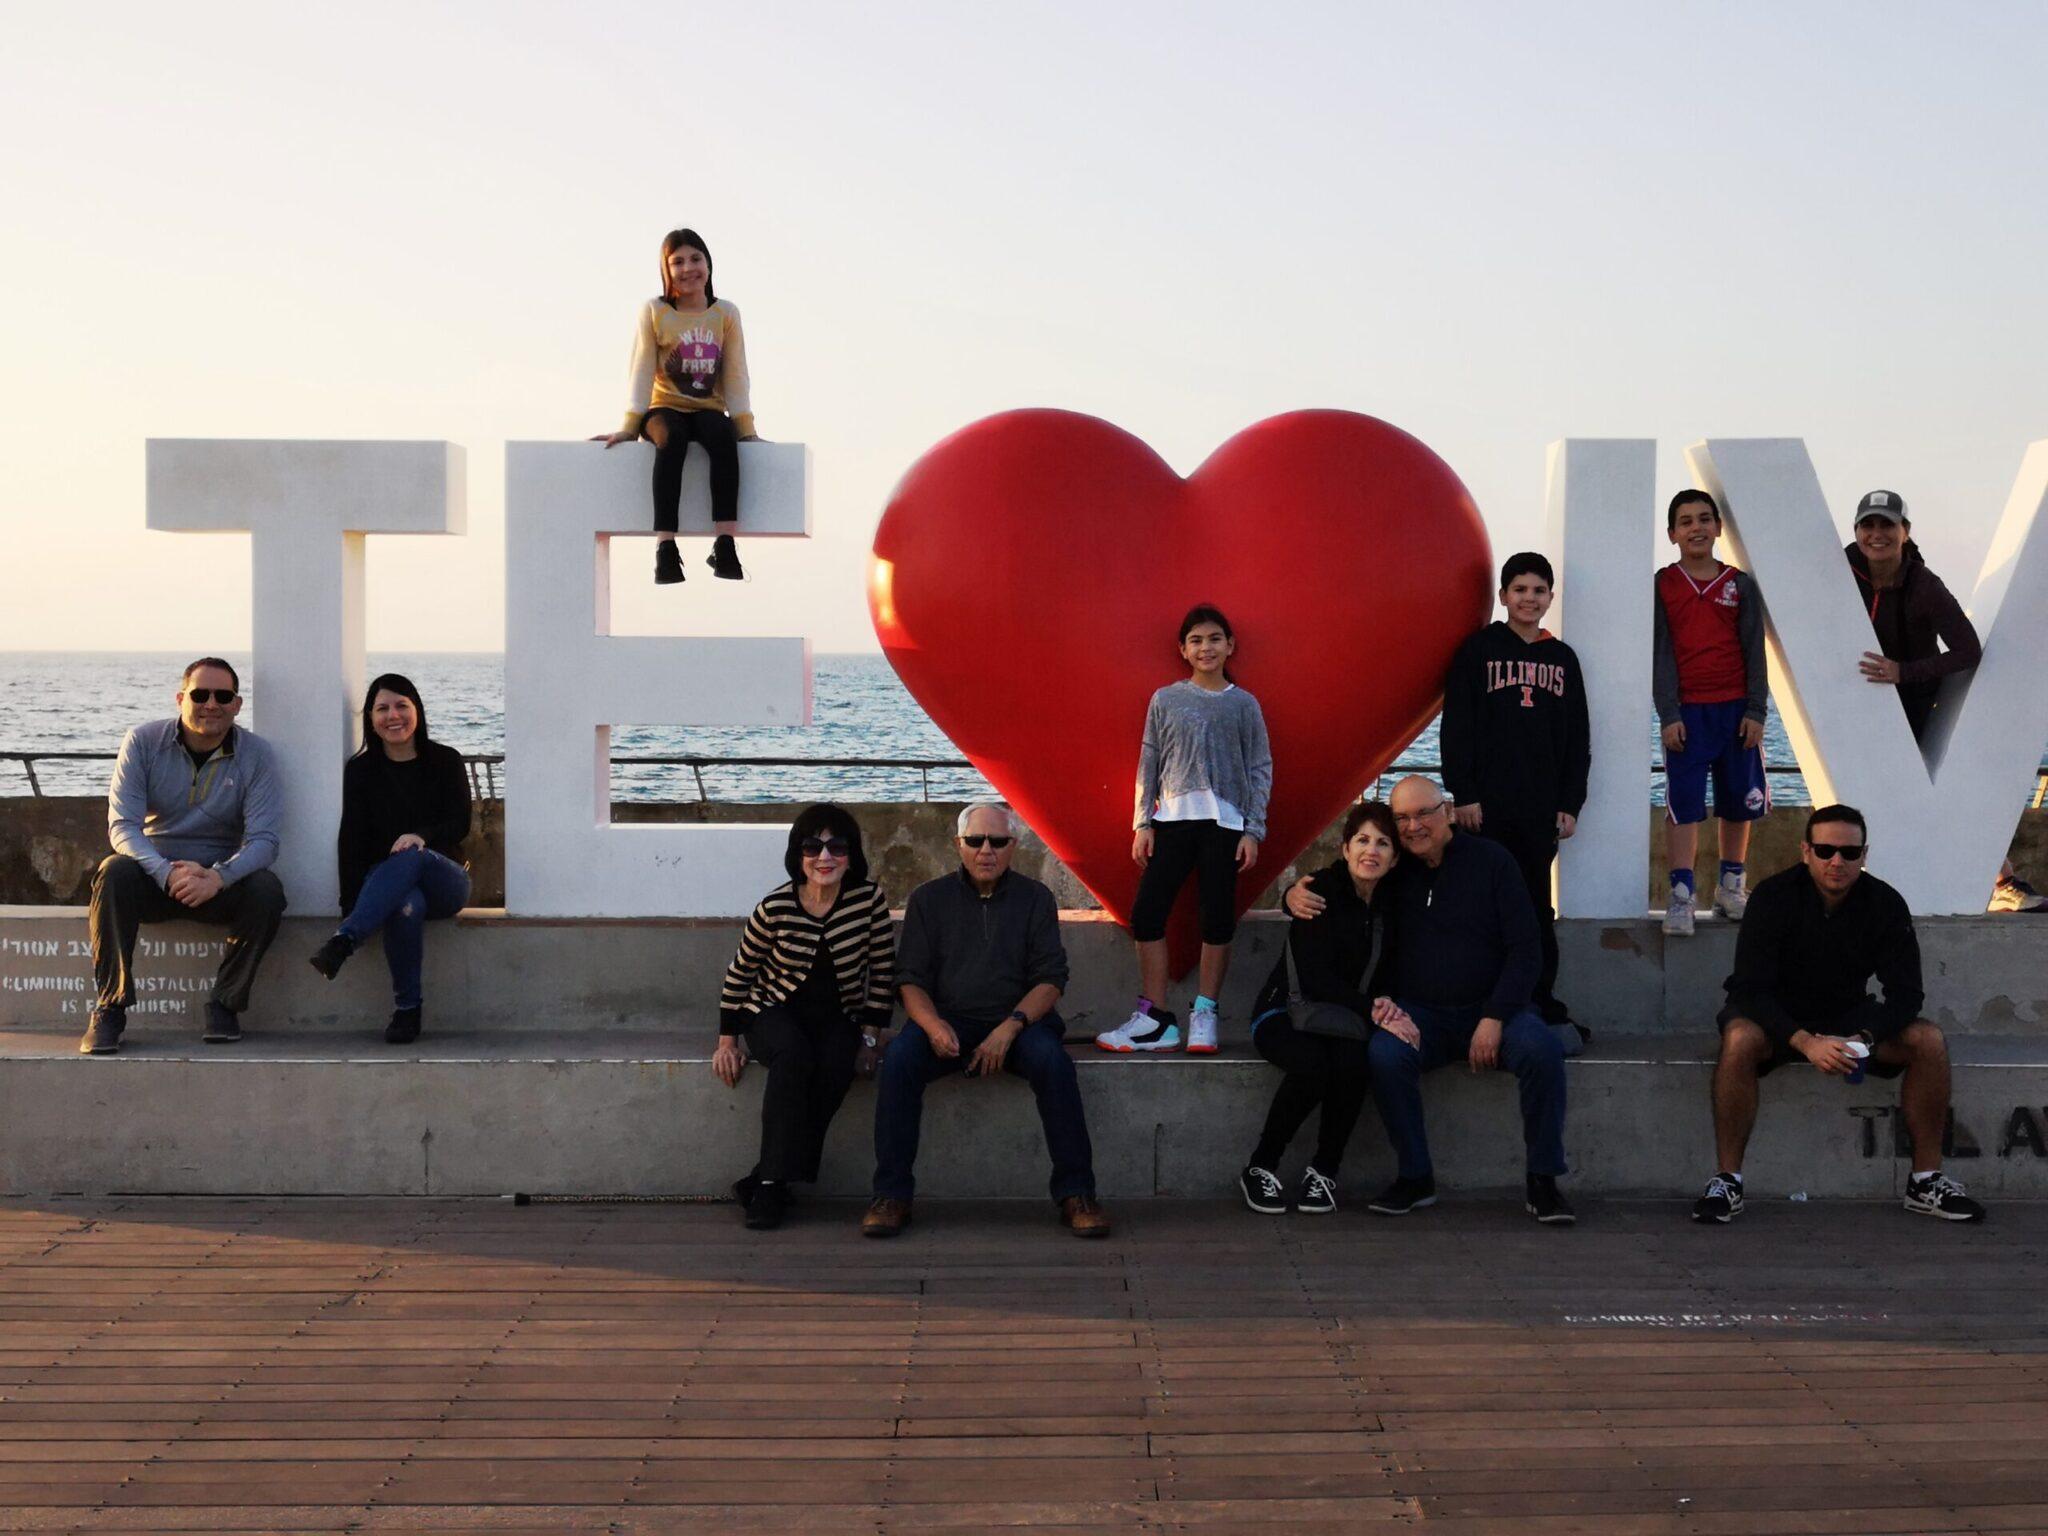 Tel Aviv & Jaffa